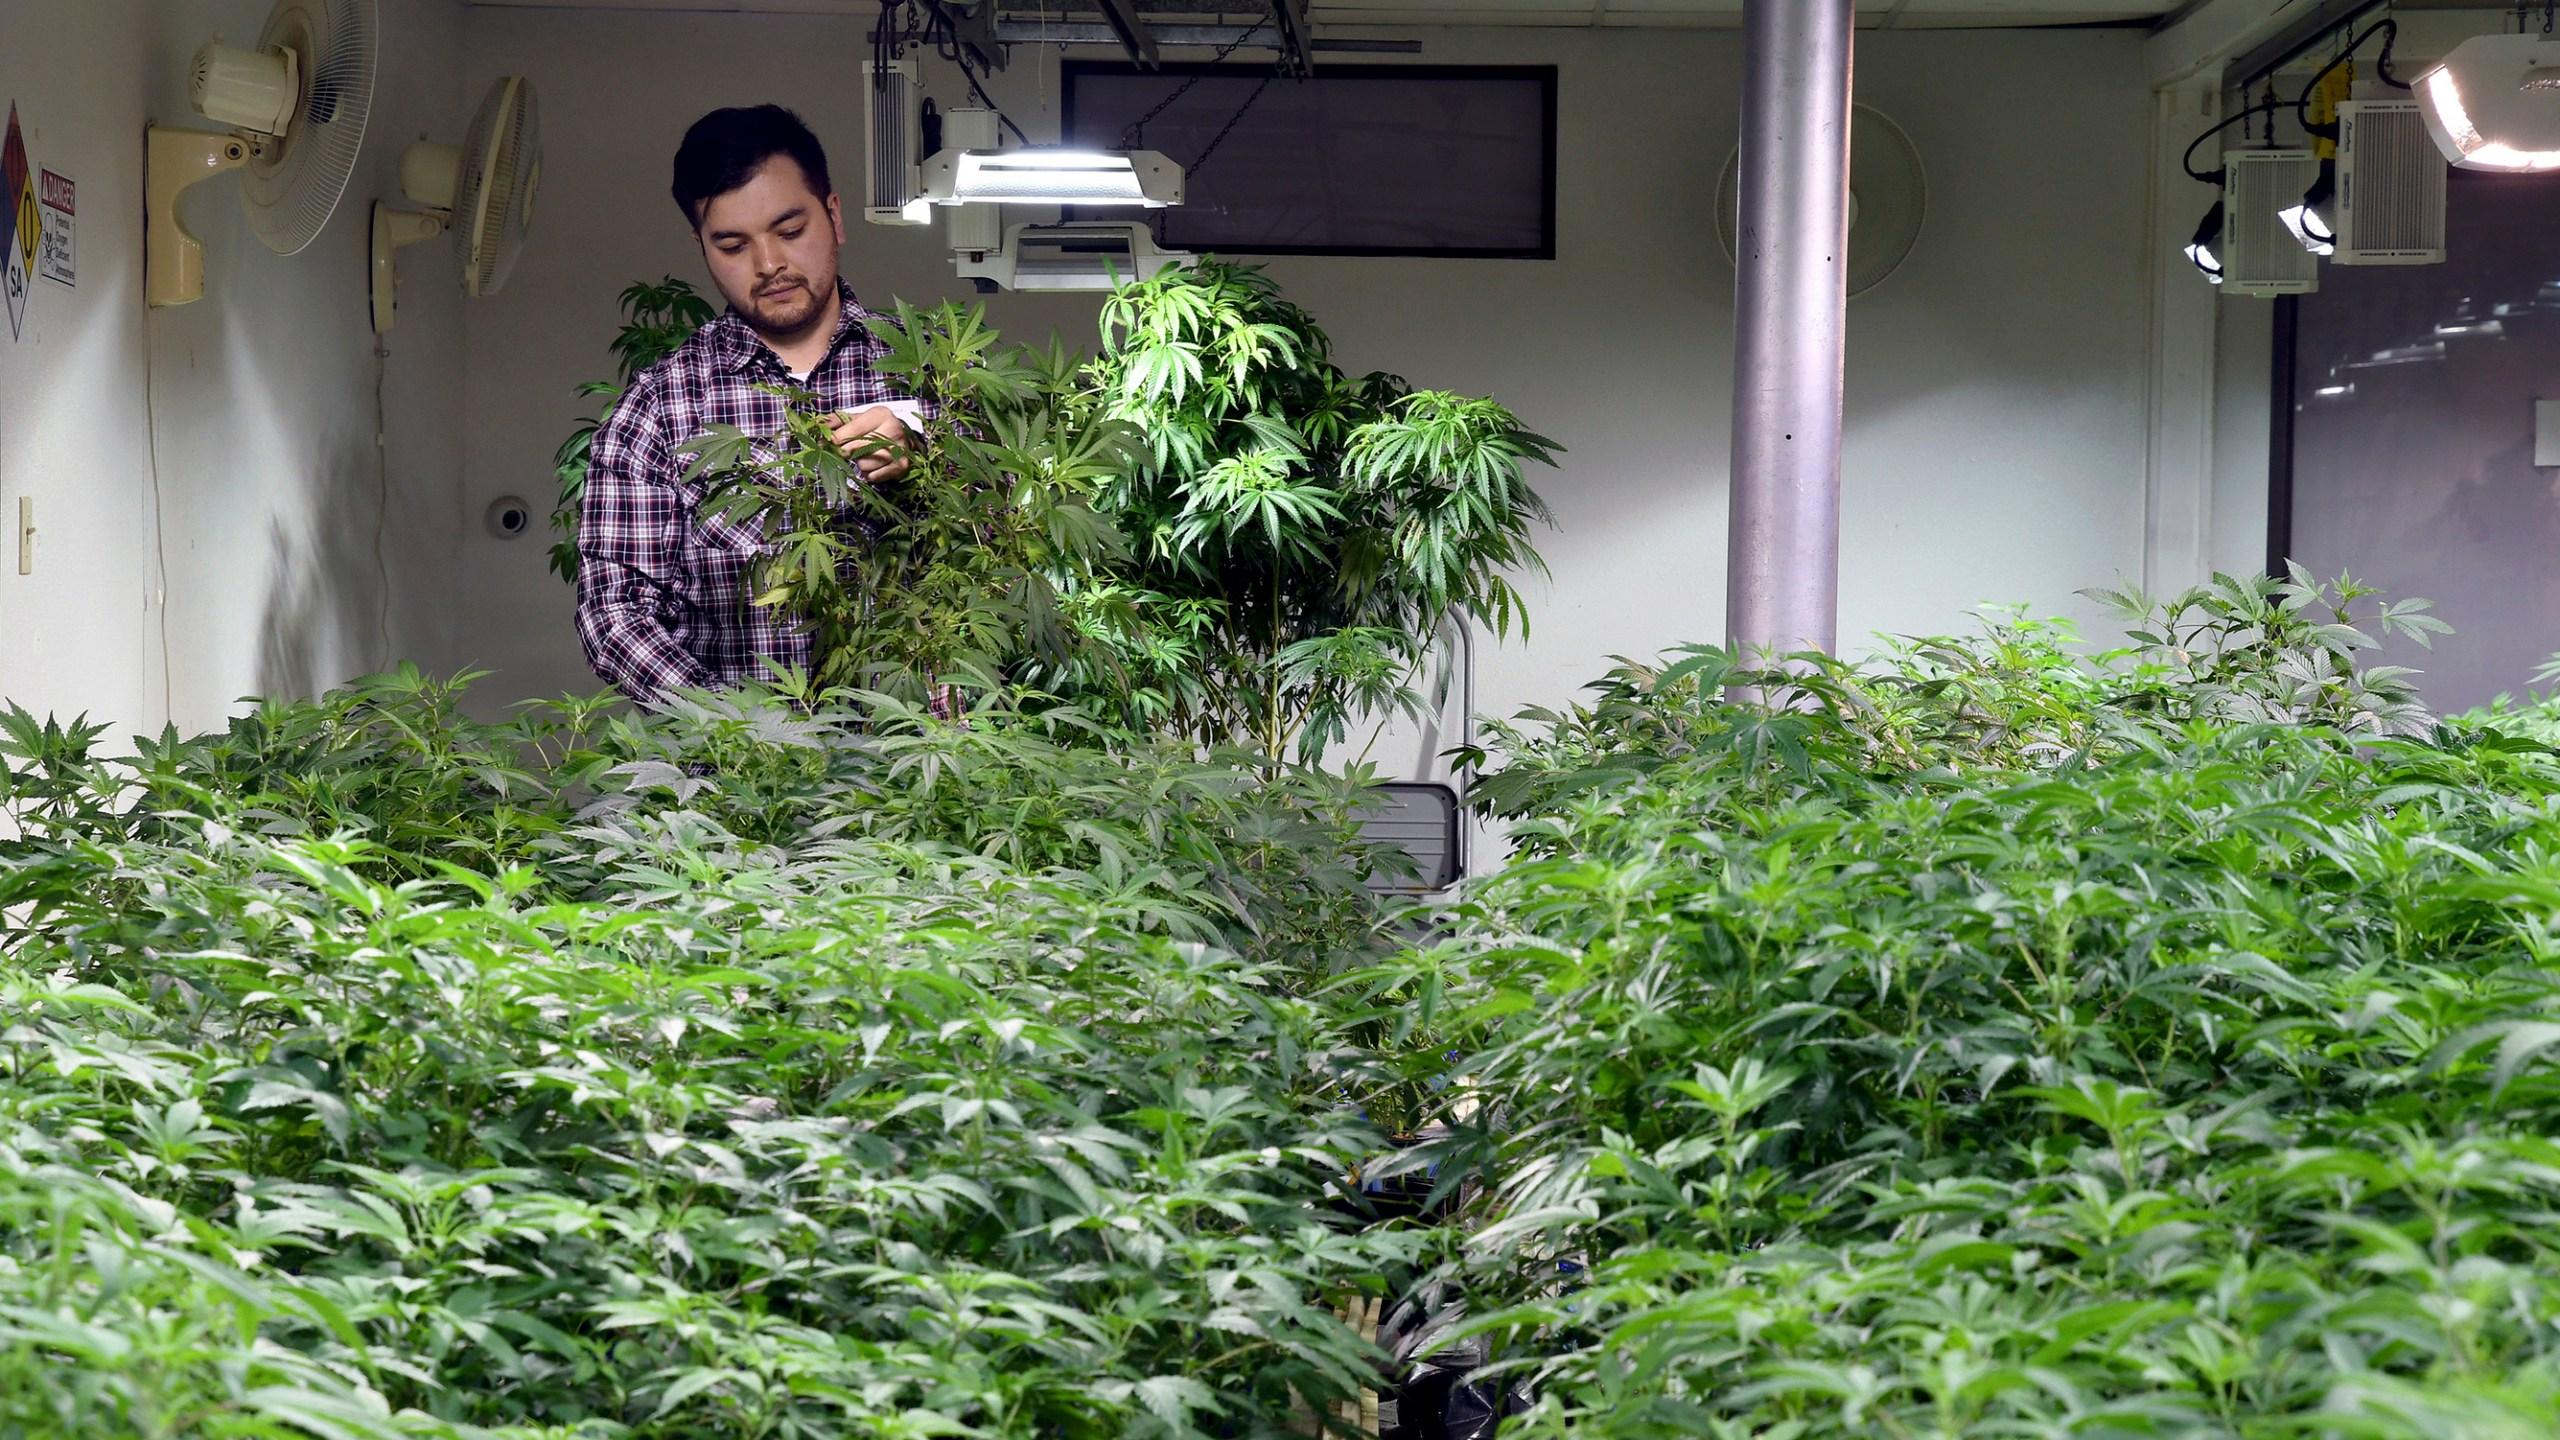 Legal_Marijuana_Citizenship_Denials_37832-159532.jpg08880154